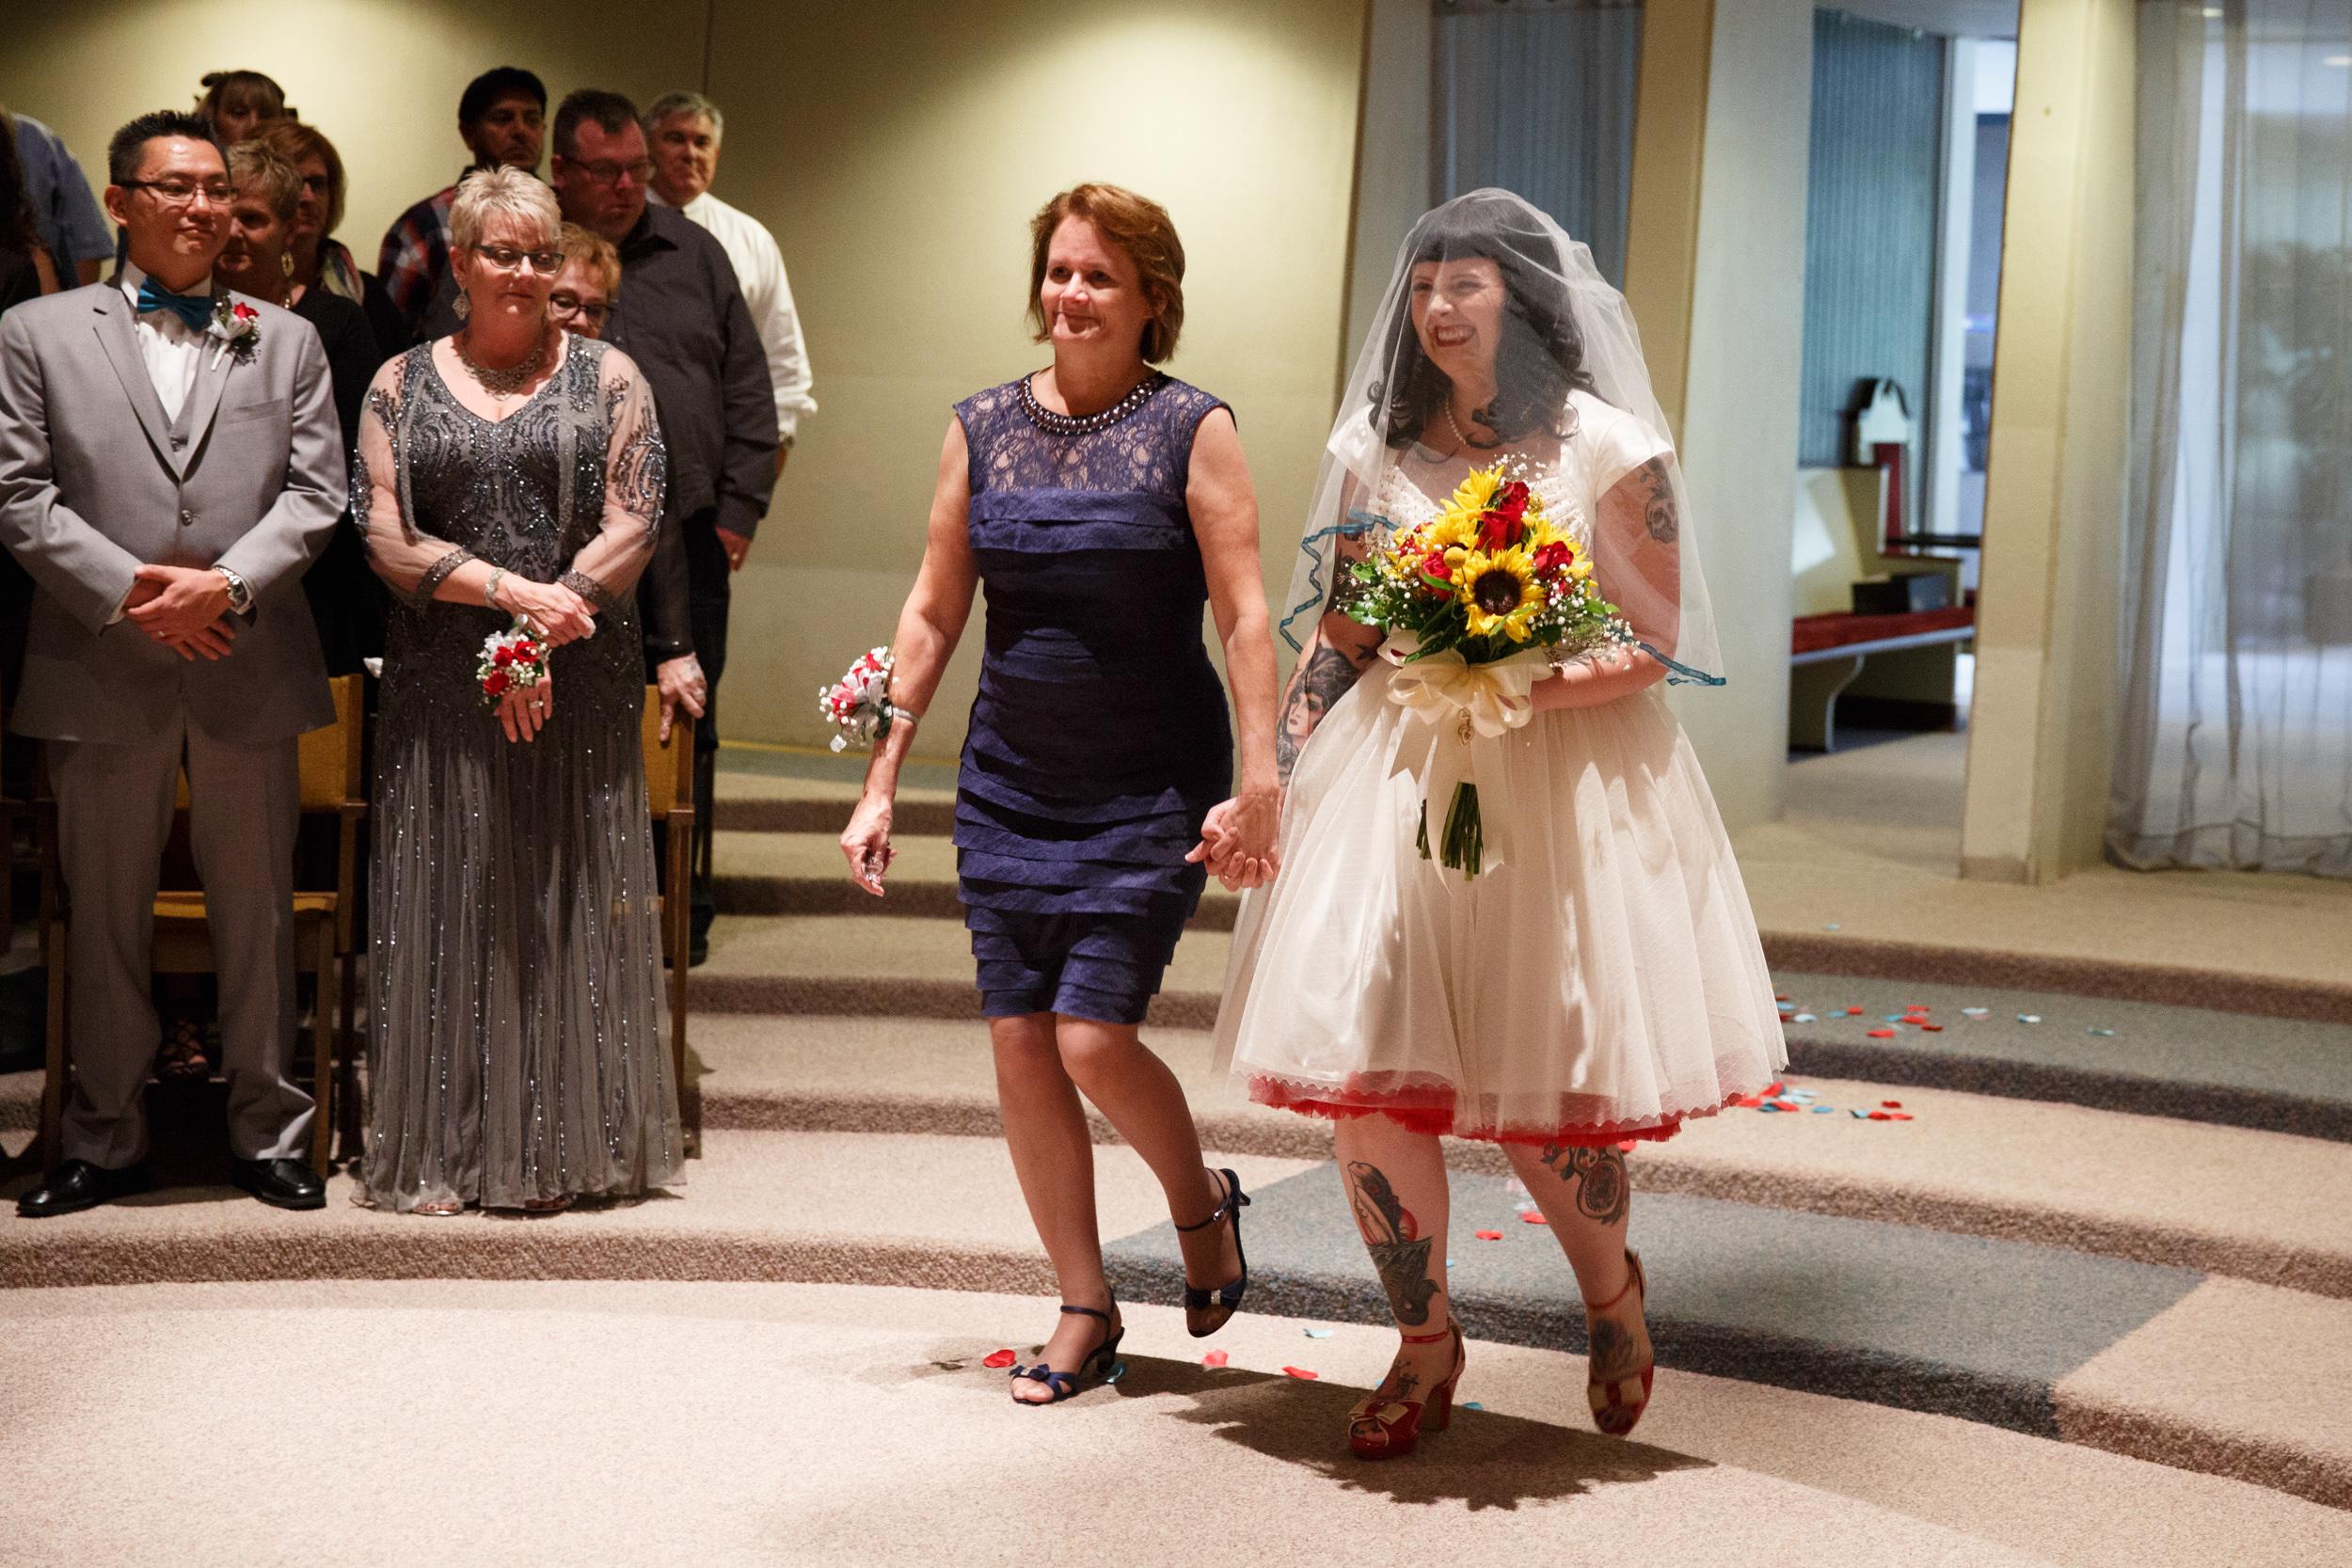 Christian & Sarah wedding photography by Brian milo-155.jpg